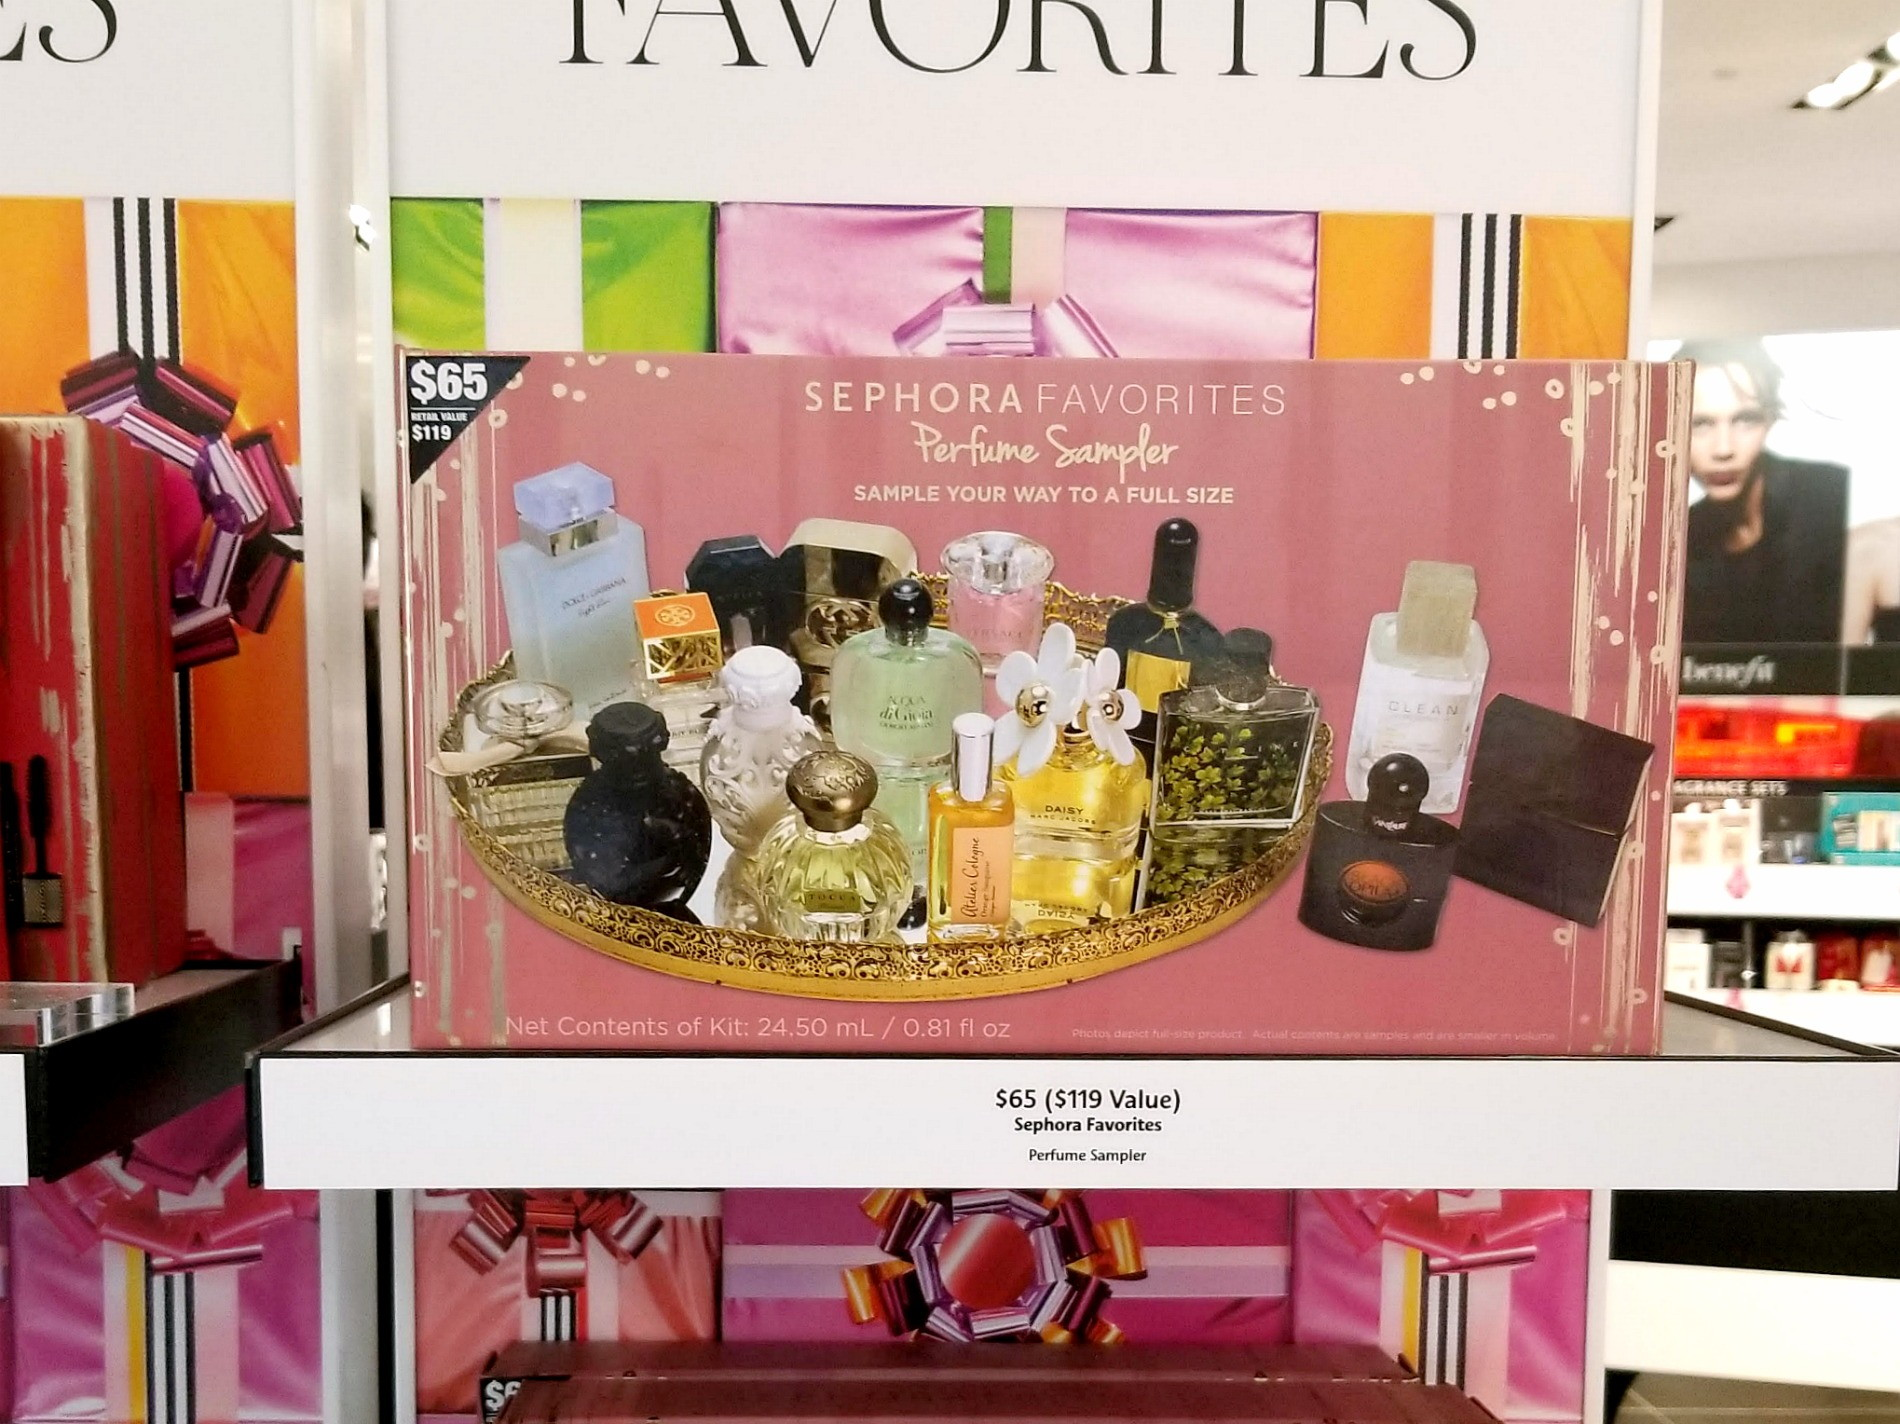 eab6fc39c935 Sephora Favorites Perfume Sampler